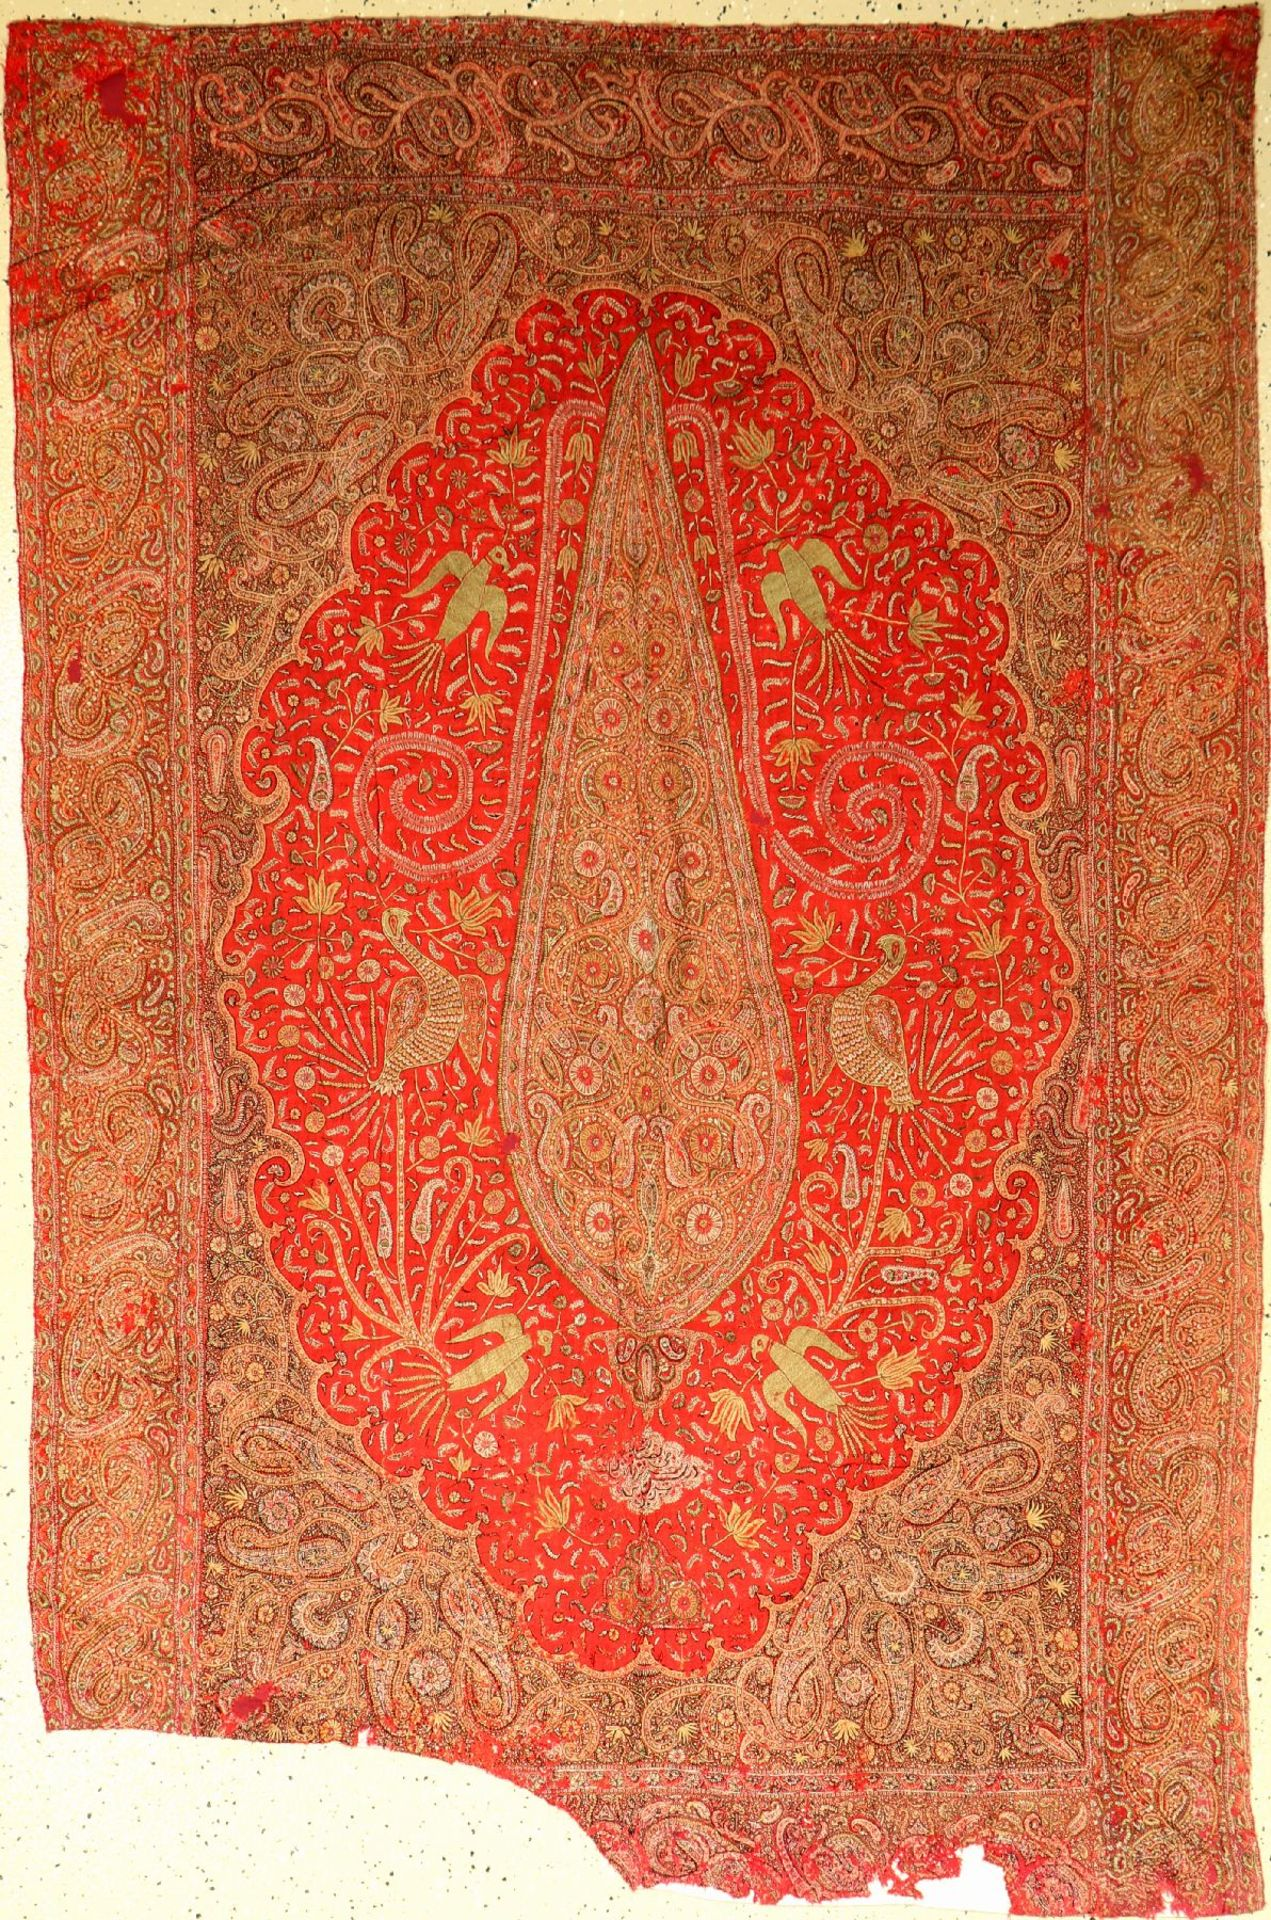 Kerman Stickerei (Fragment), Persien, um 1900, Wolle, ca. 191 x 125 cmKerman embroidery (